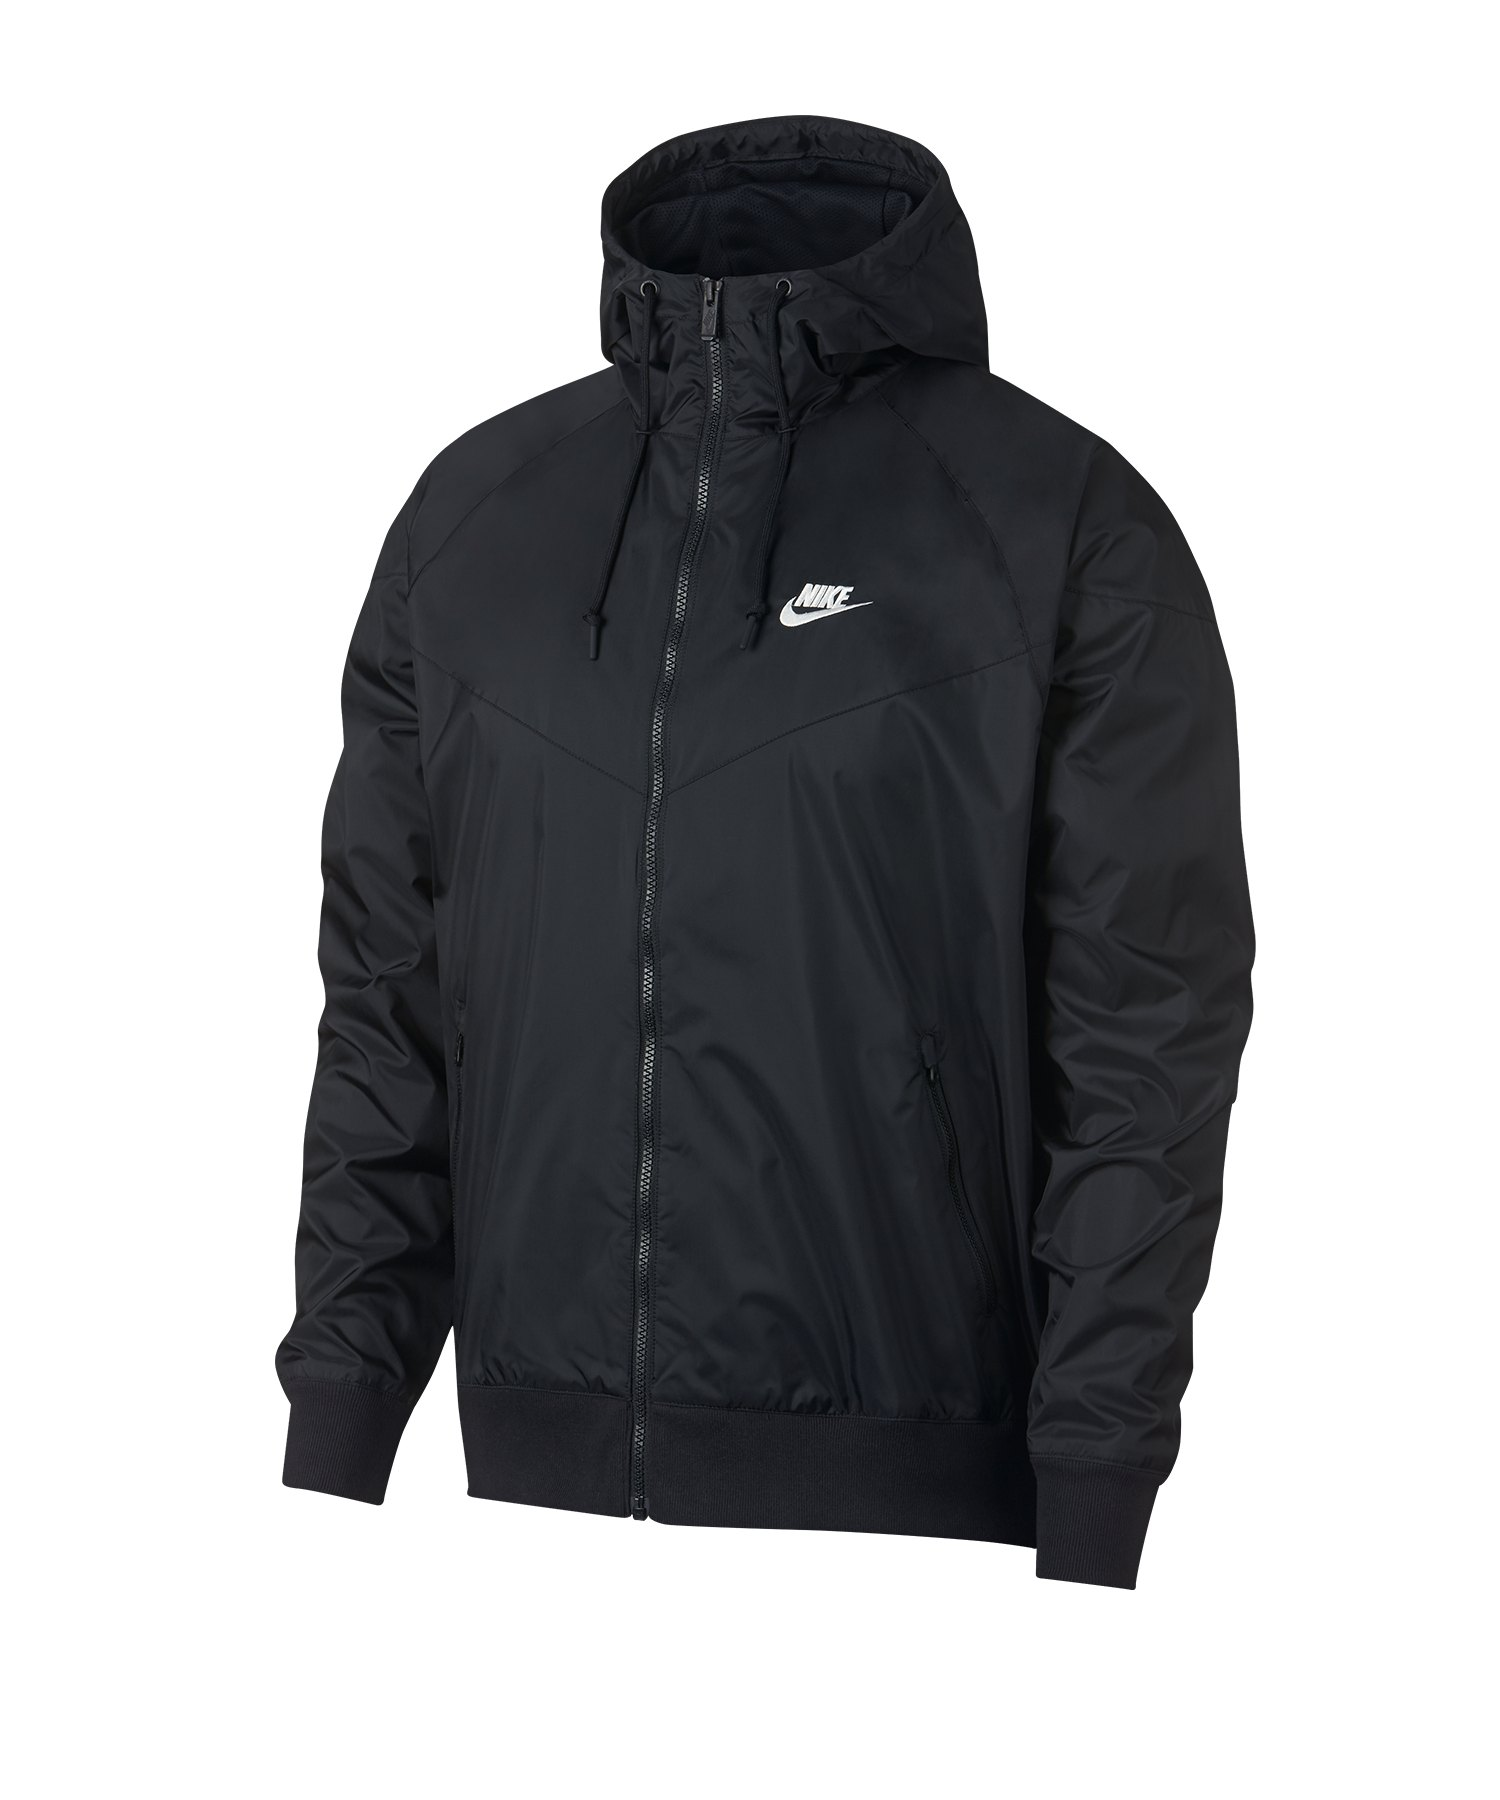 Nike Windrunner Kapuzenjacke Schwarz F010 - schwarz